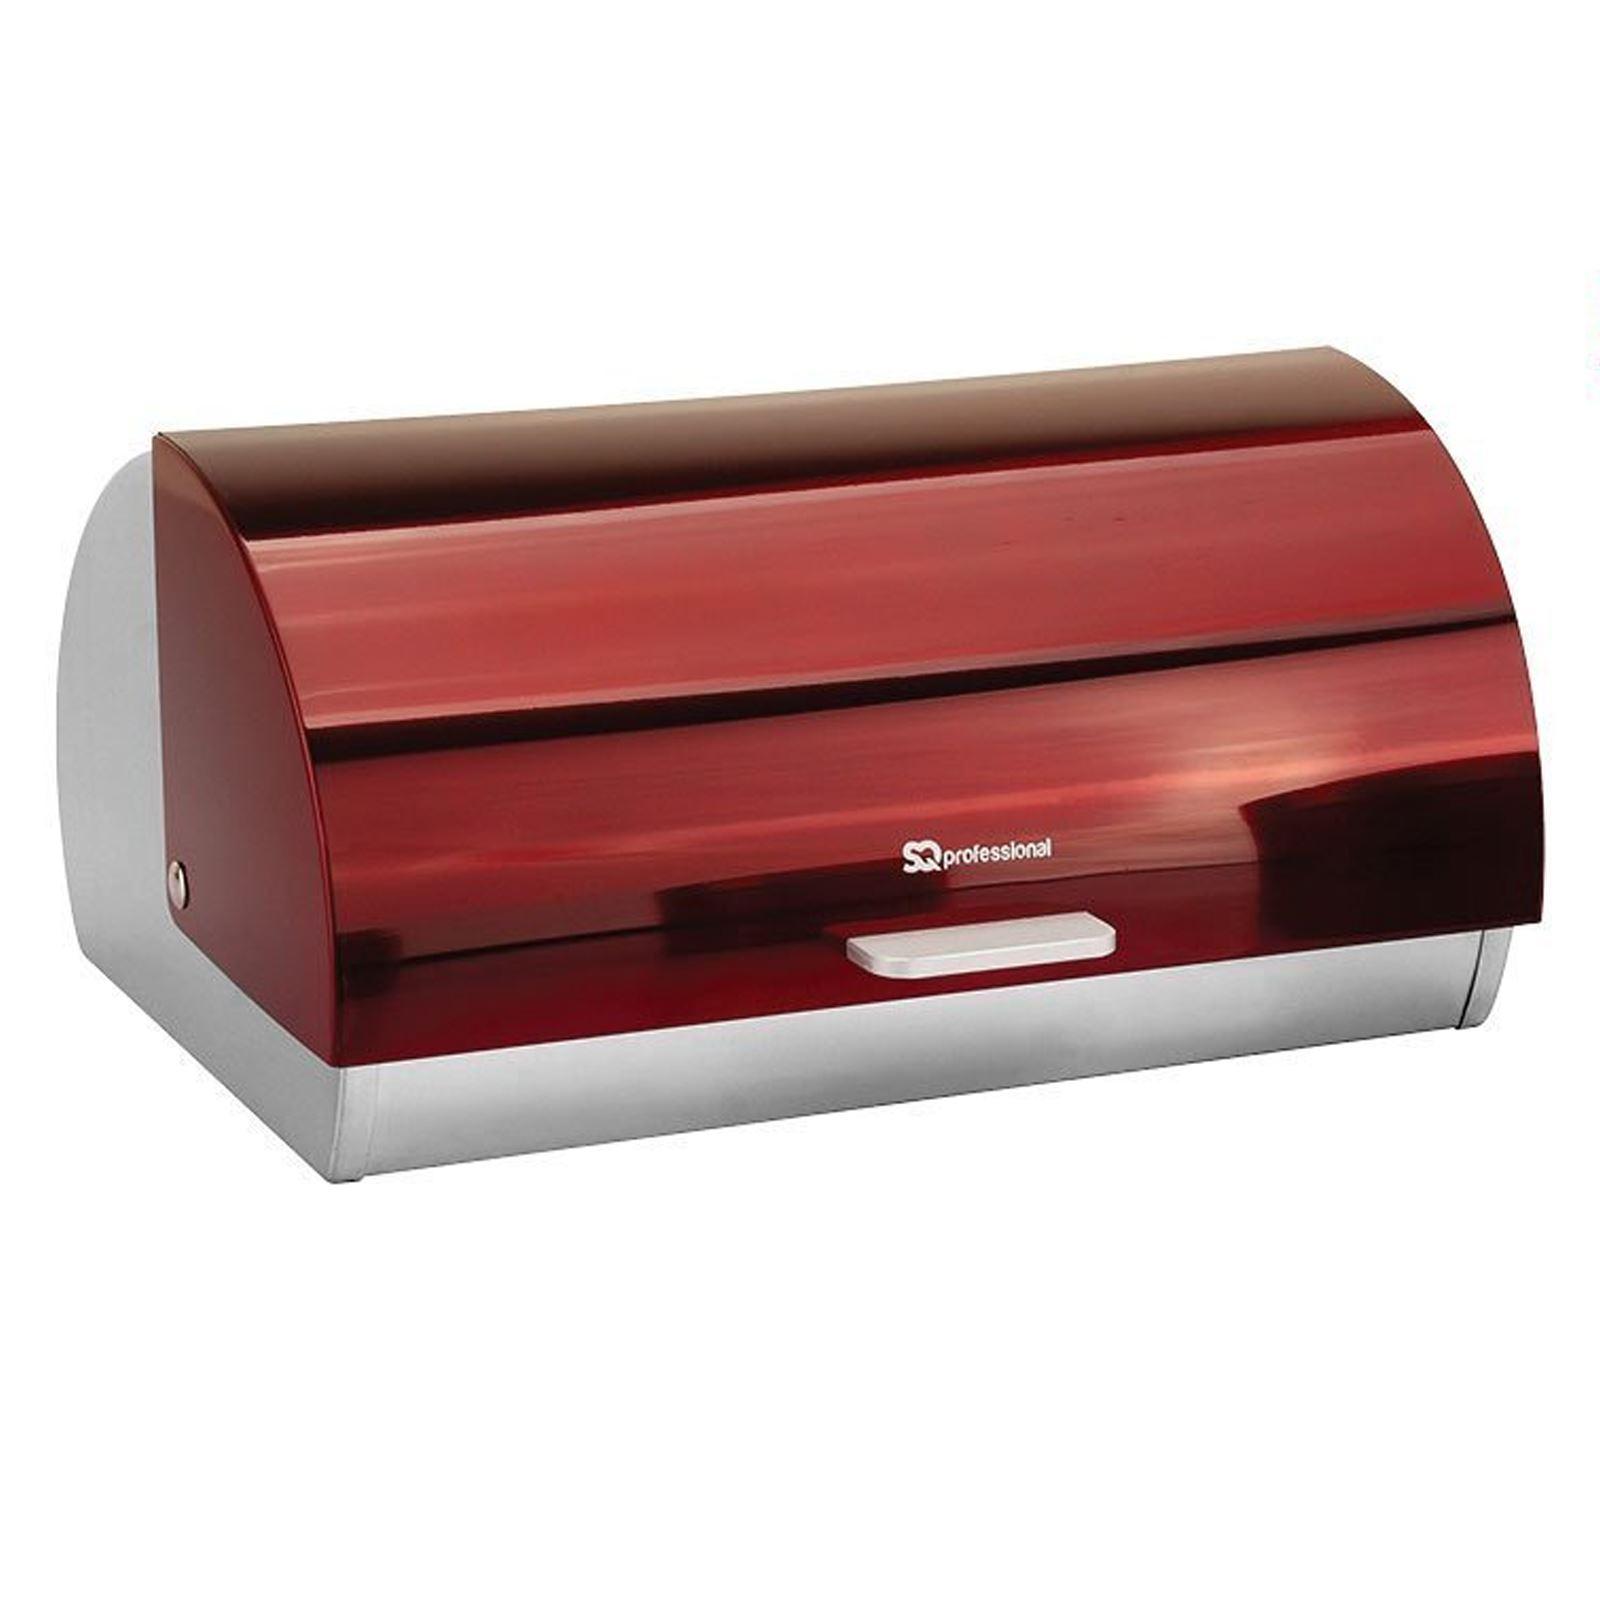 Metallic-Roll-Top-Bread-Bin-Tea-Coffee-Sugar-Jar-Canister-Sets-Kitchen-Storage thumbnail 29